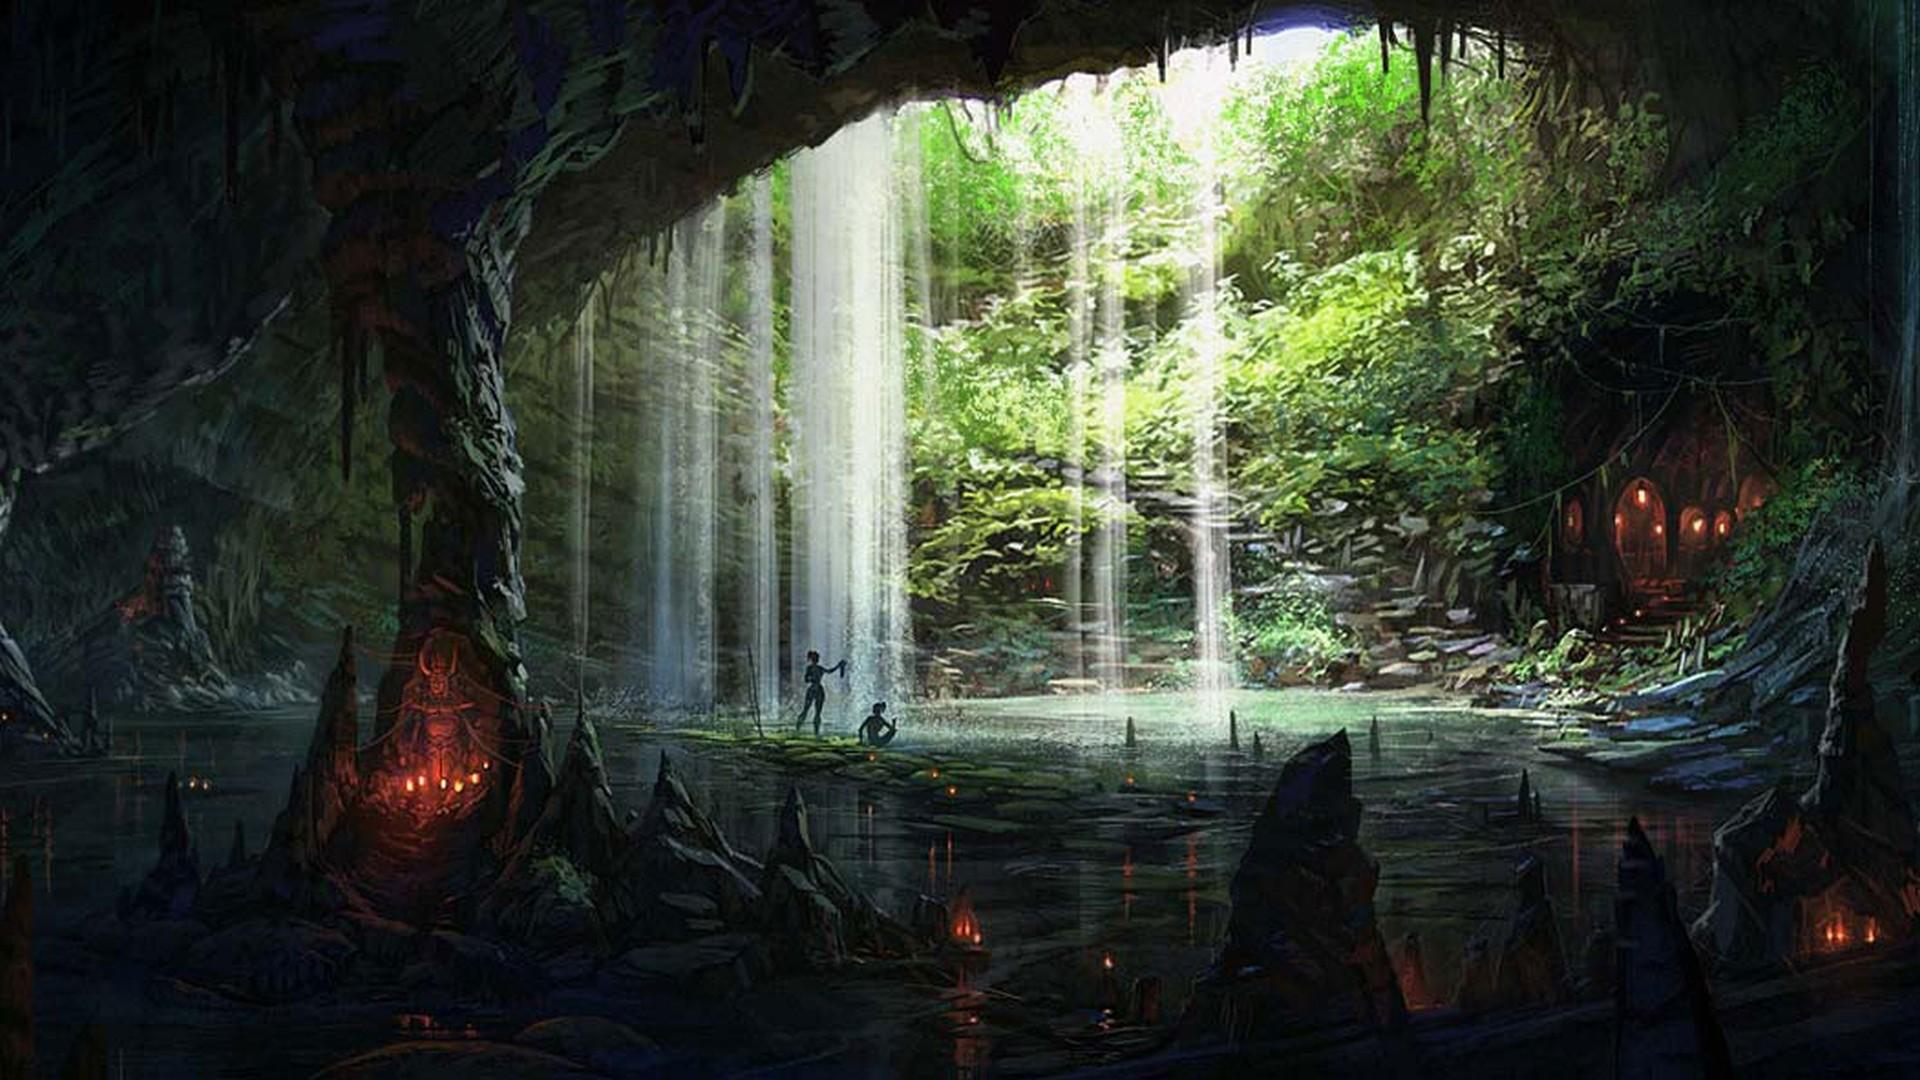 Amazing Cave Wallpaper